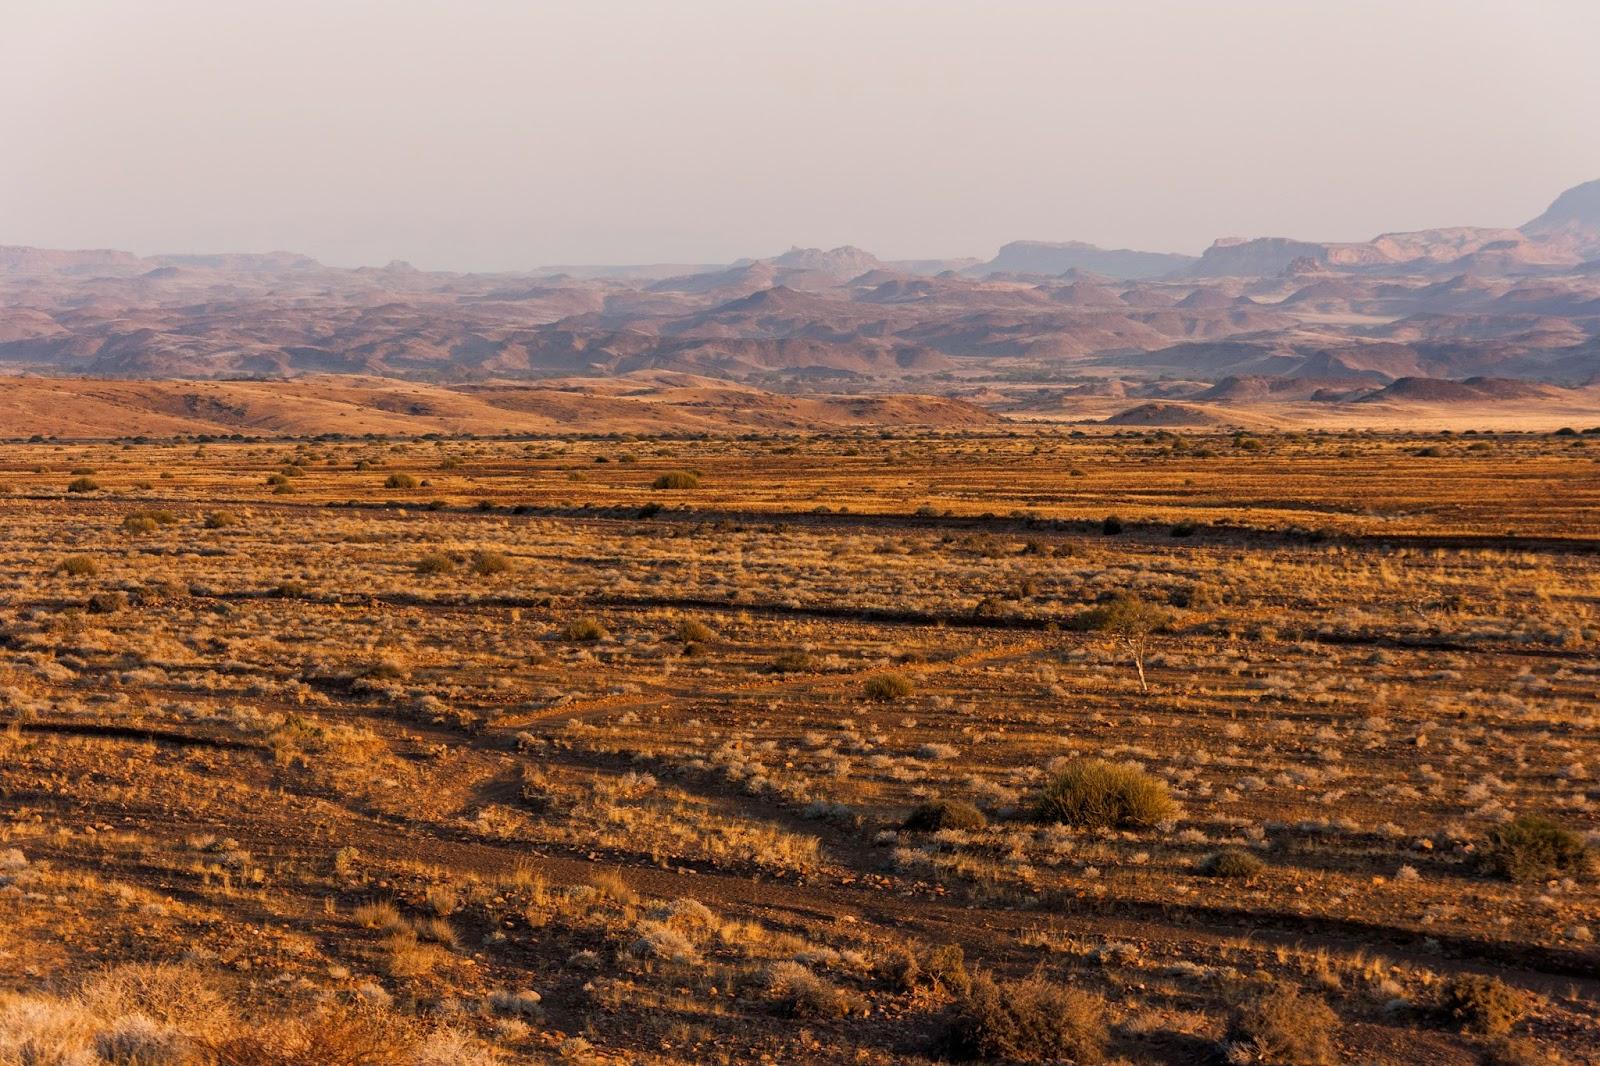 tributary river damaralnd namibia